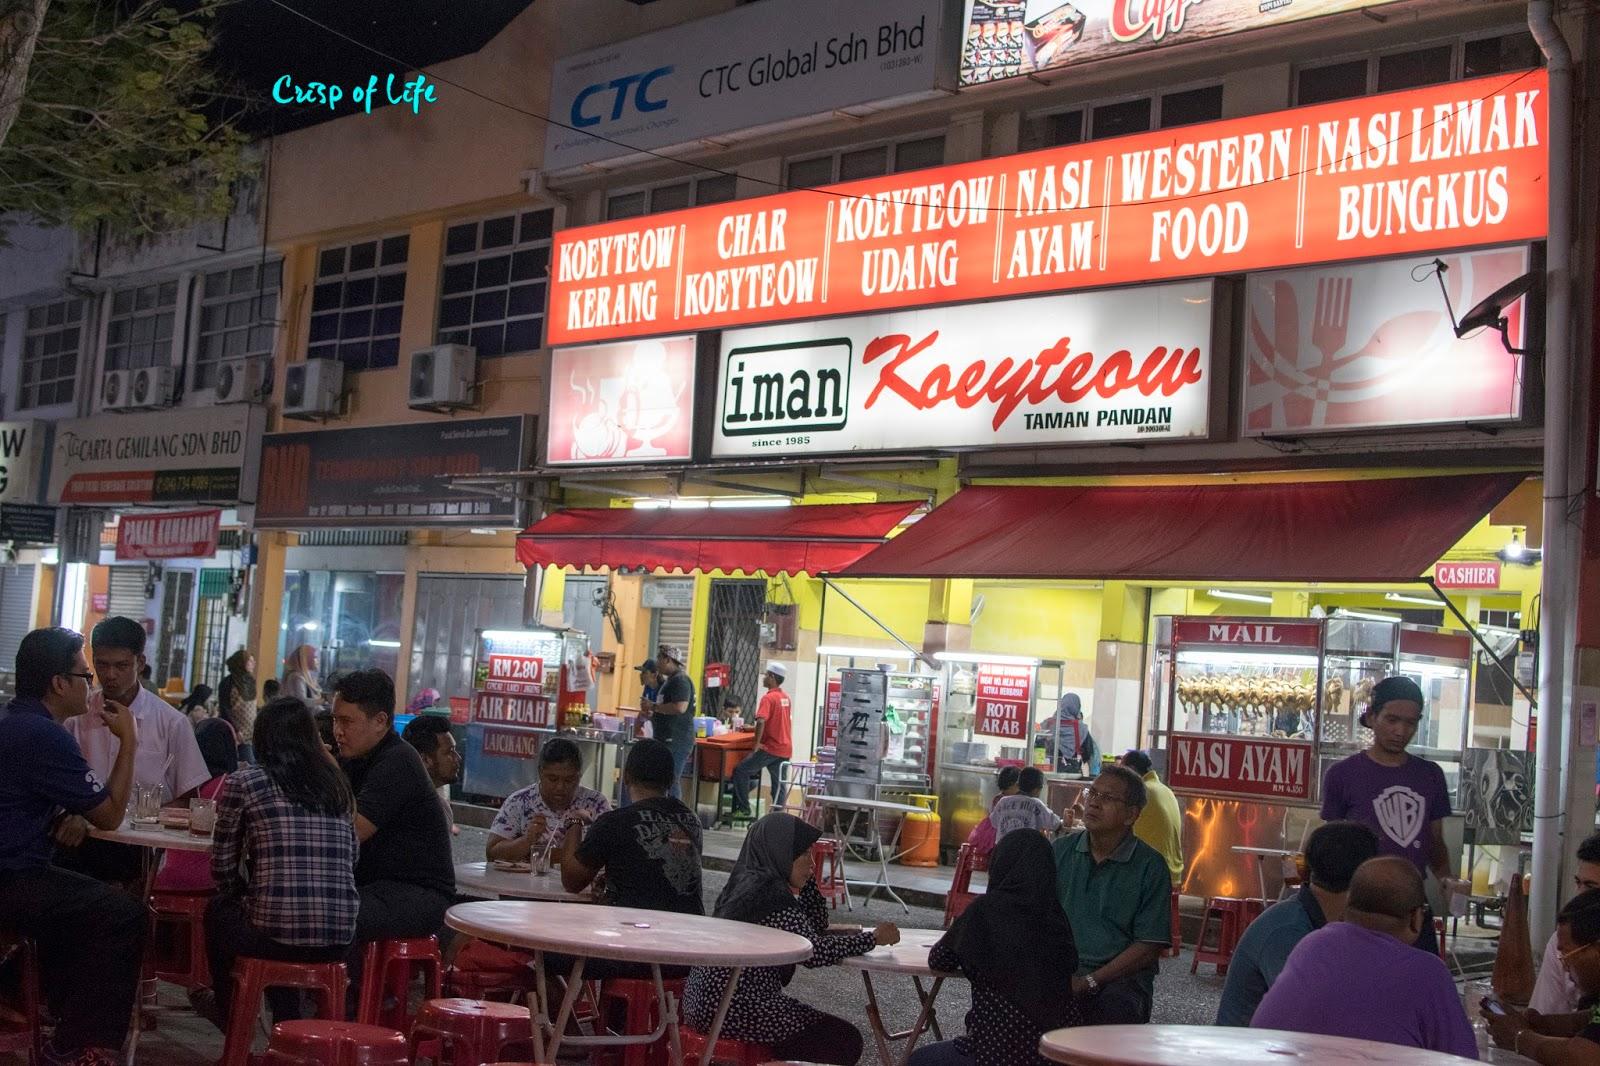 Koay Teow Kerang Iman Alor Setar